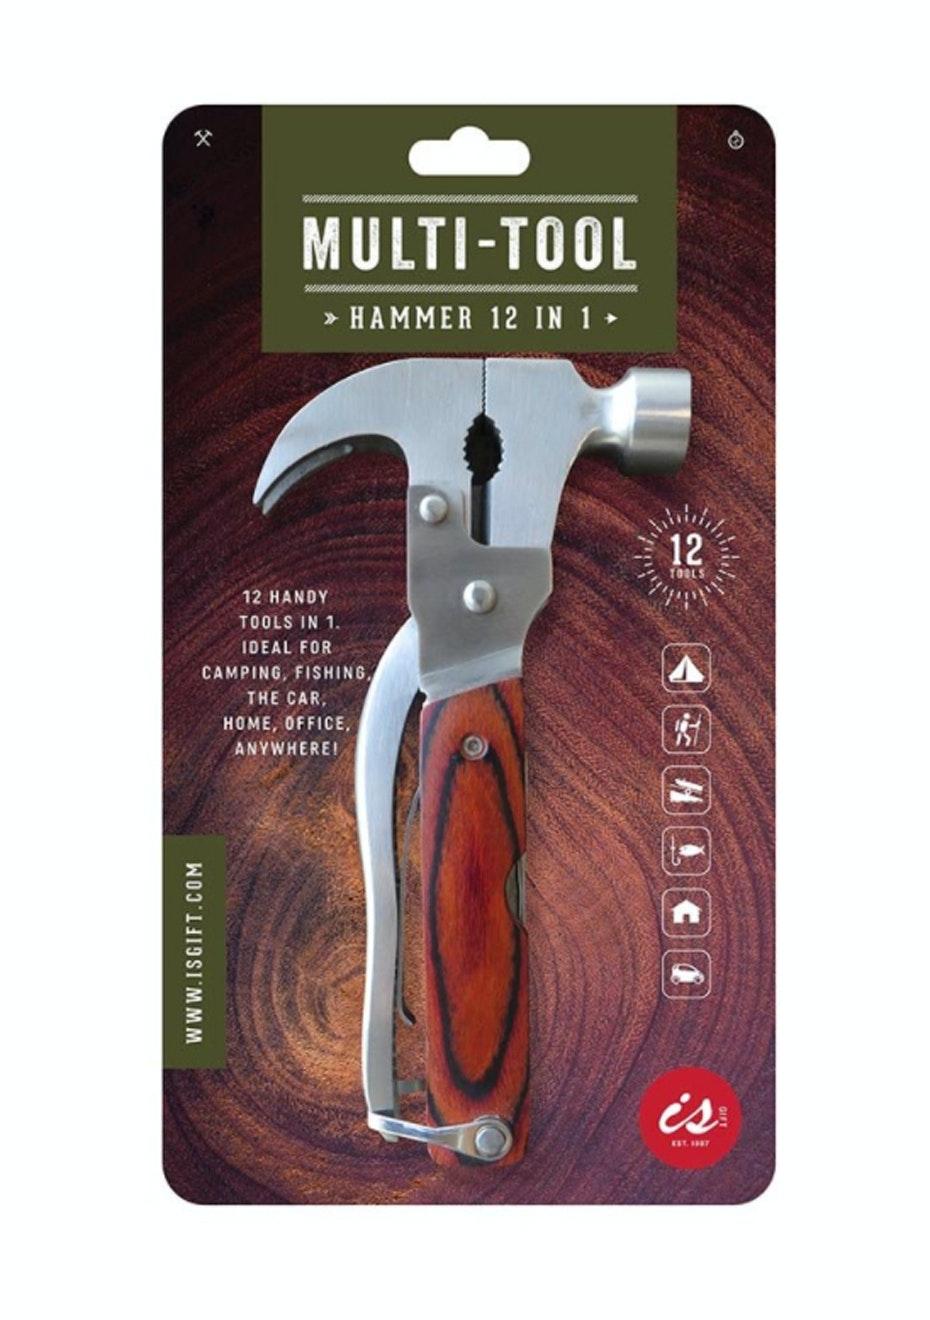 Hammer 12 in 1 Multi Tool